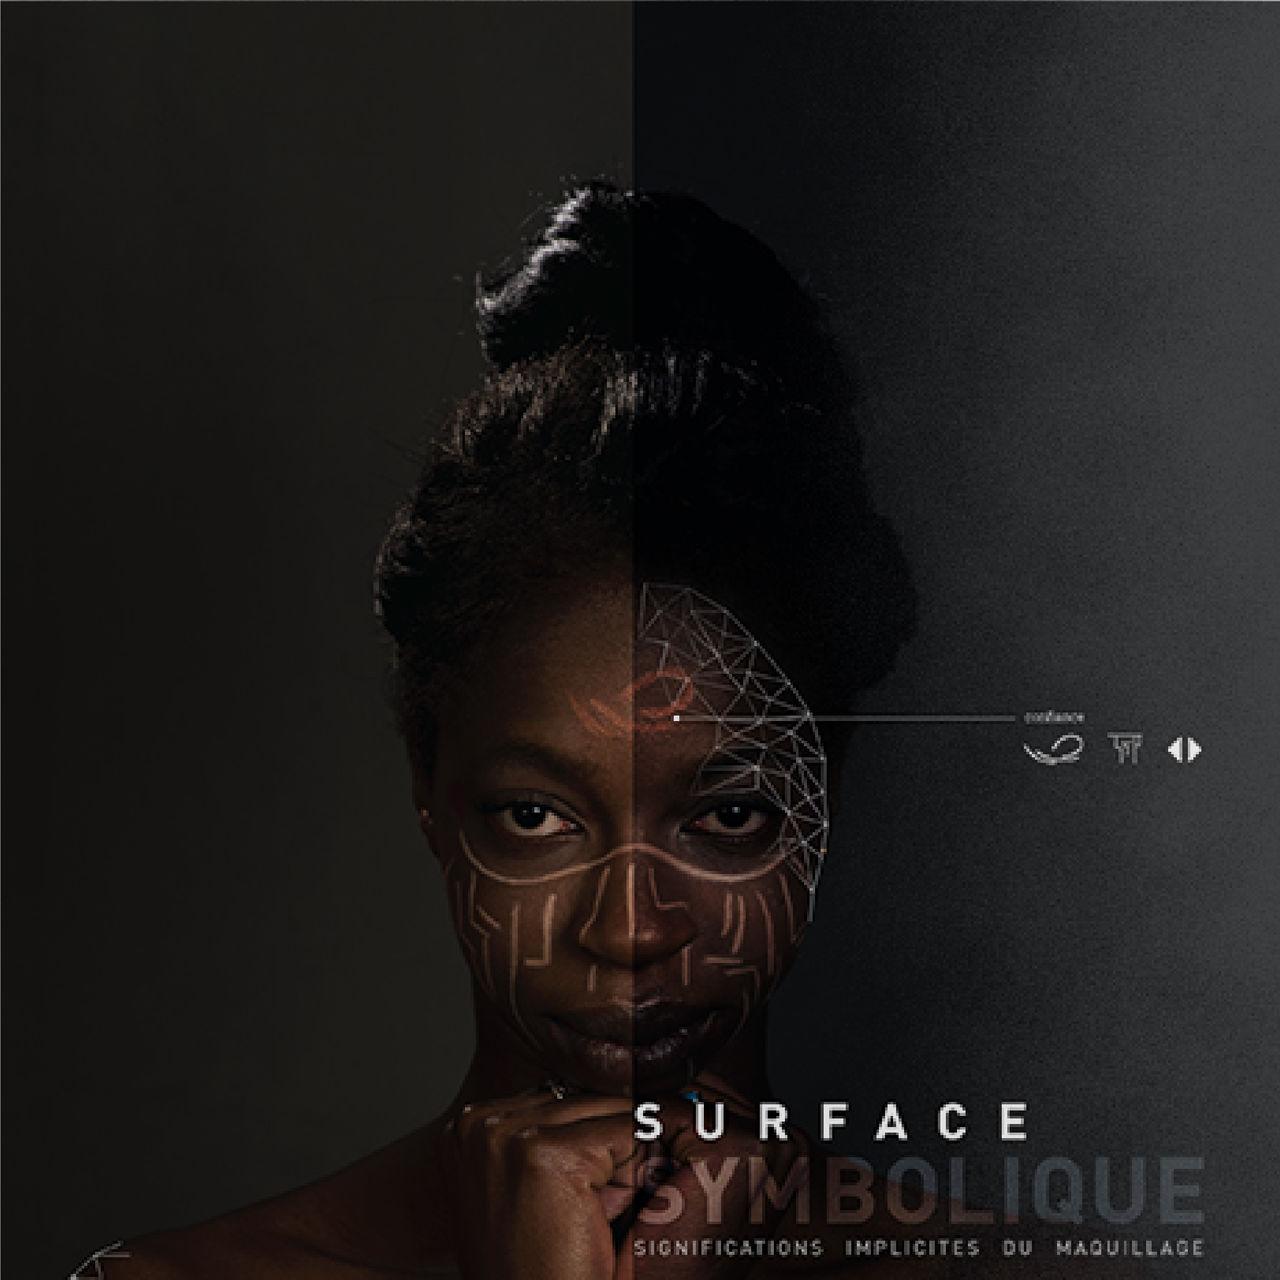 Surface Symbolique